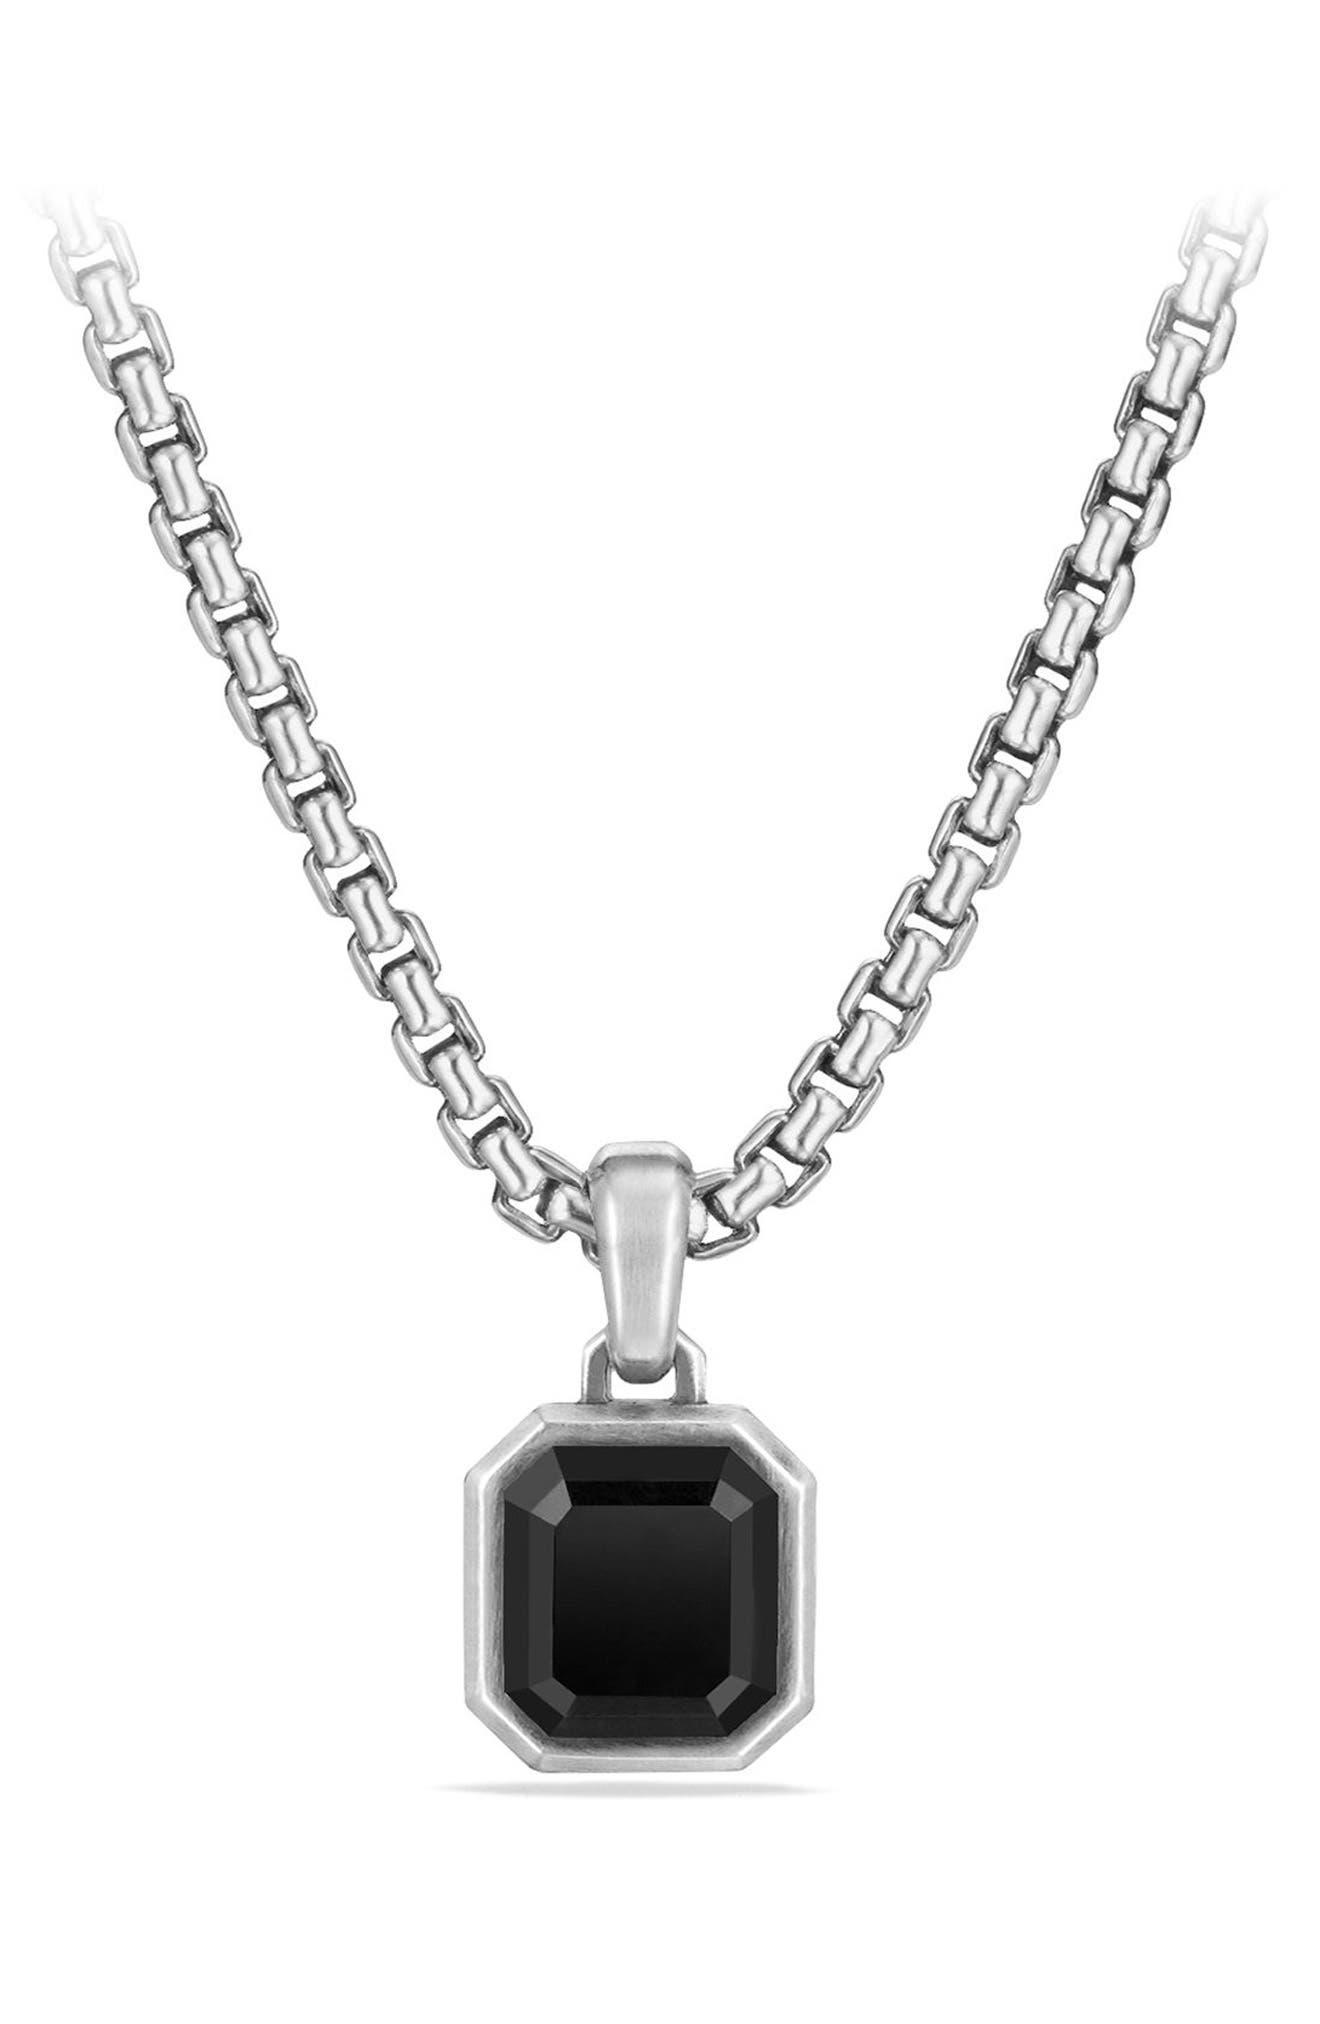 Emerald Cut Semiprecious Stone Amulet,                             Main thumbnail 1, color,                             SILVER/ BLACK ONYX